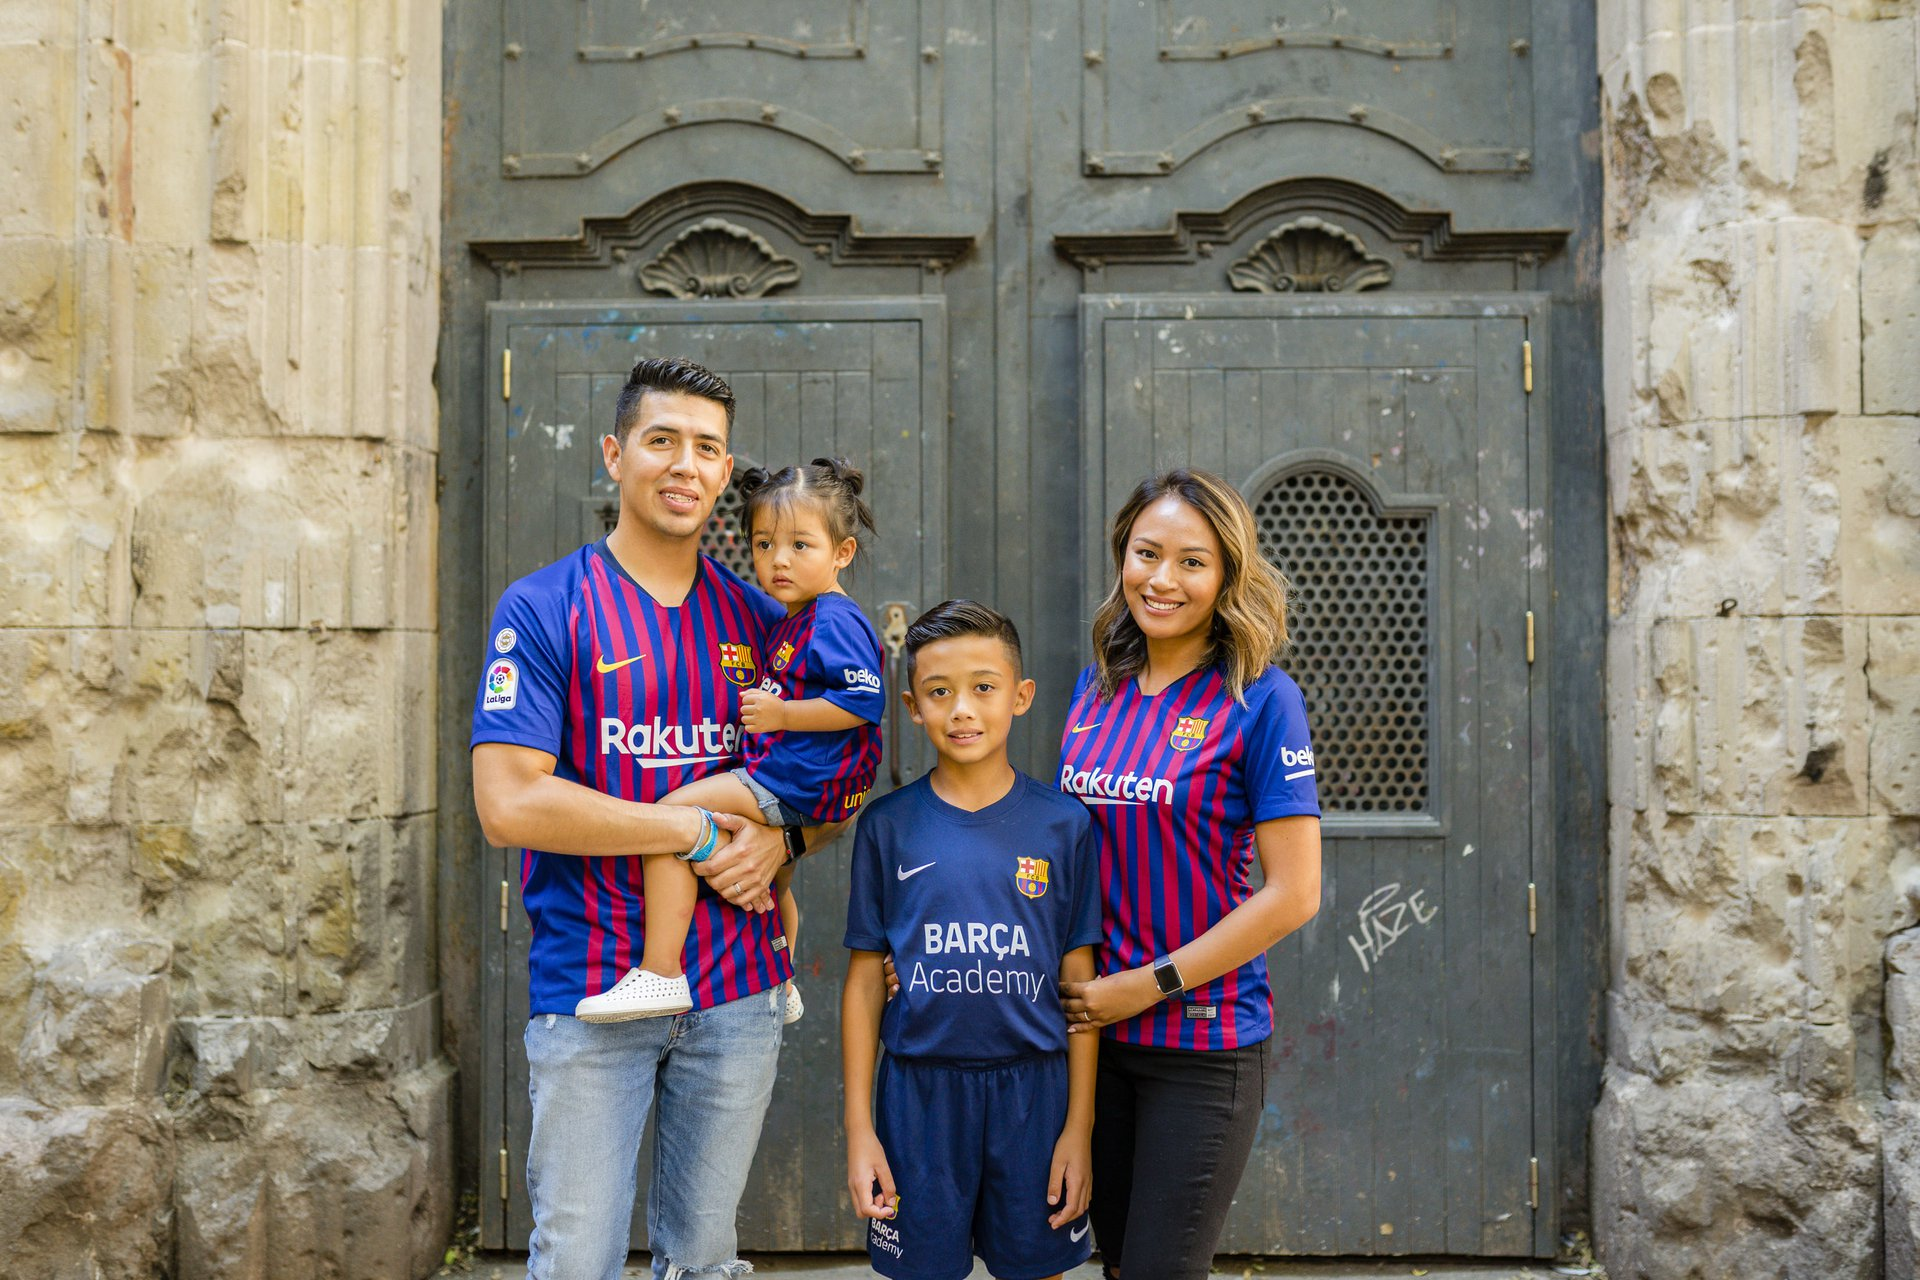 Flytographer Travel Story - Soccer Camp in Barcelona!